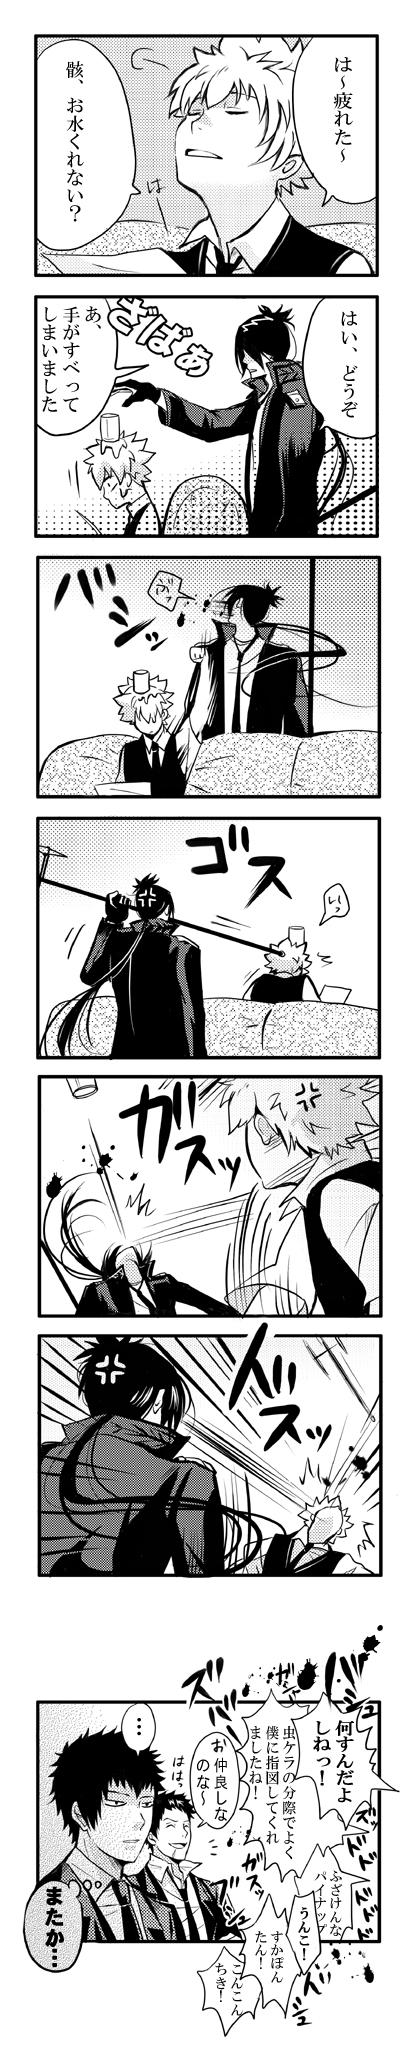 Tags: Anime, Pixiv Id 2635740, Katekyo Hitman REBORN!, Rokudou Mukuro, Sawada Tsunayoshi, Yamamoto Takeshi, Hibari Kyoya, Pixiv, Comic, Translation Request